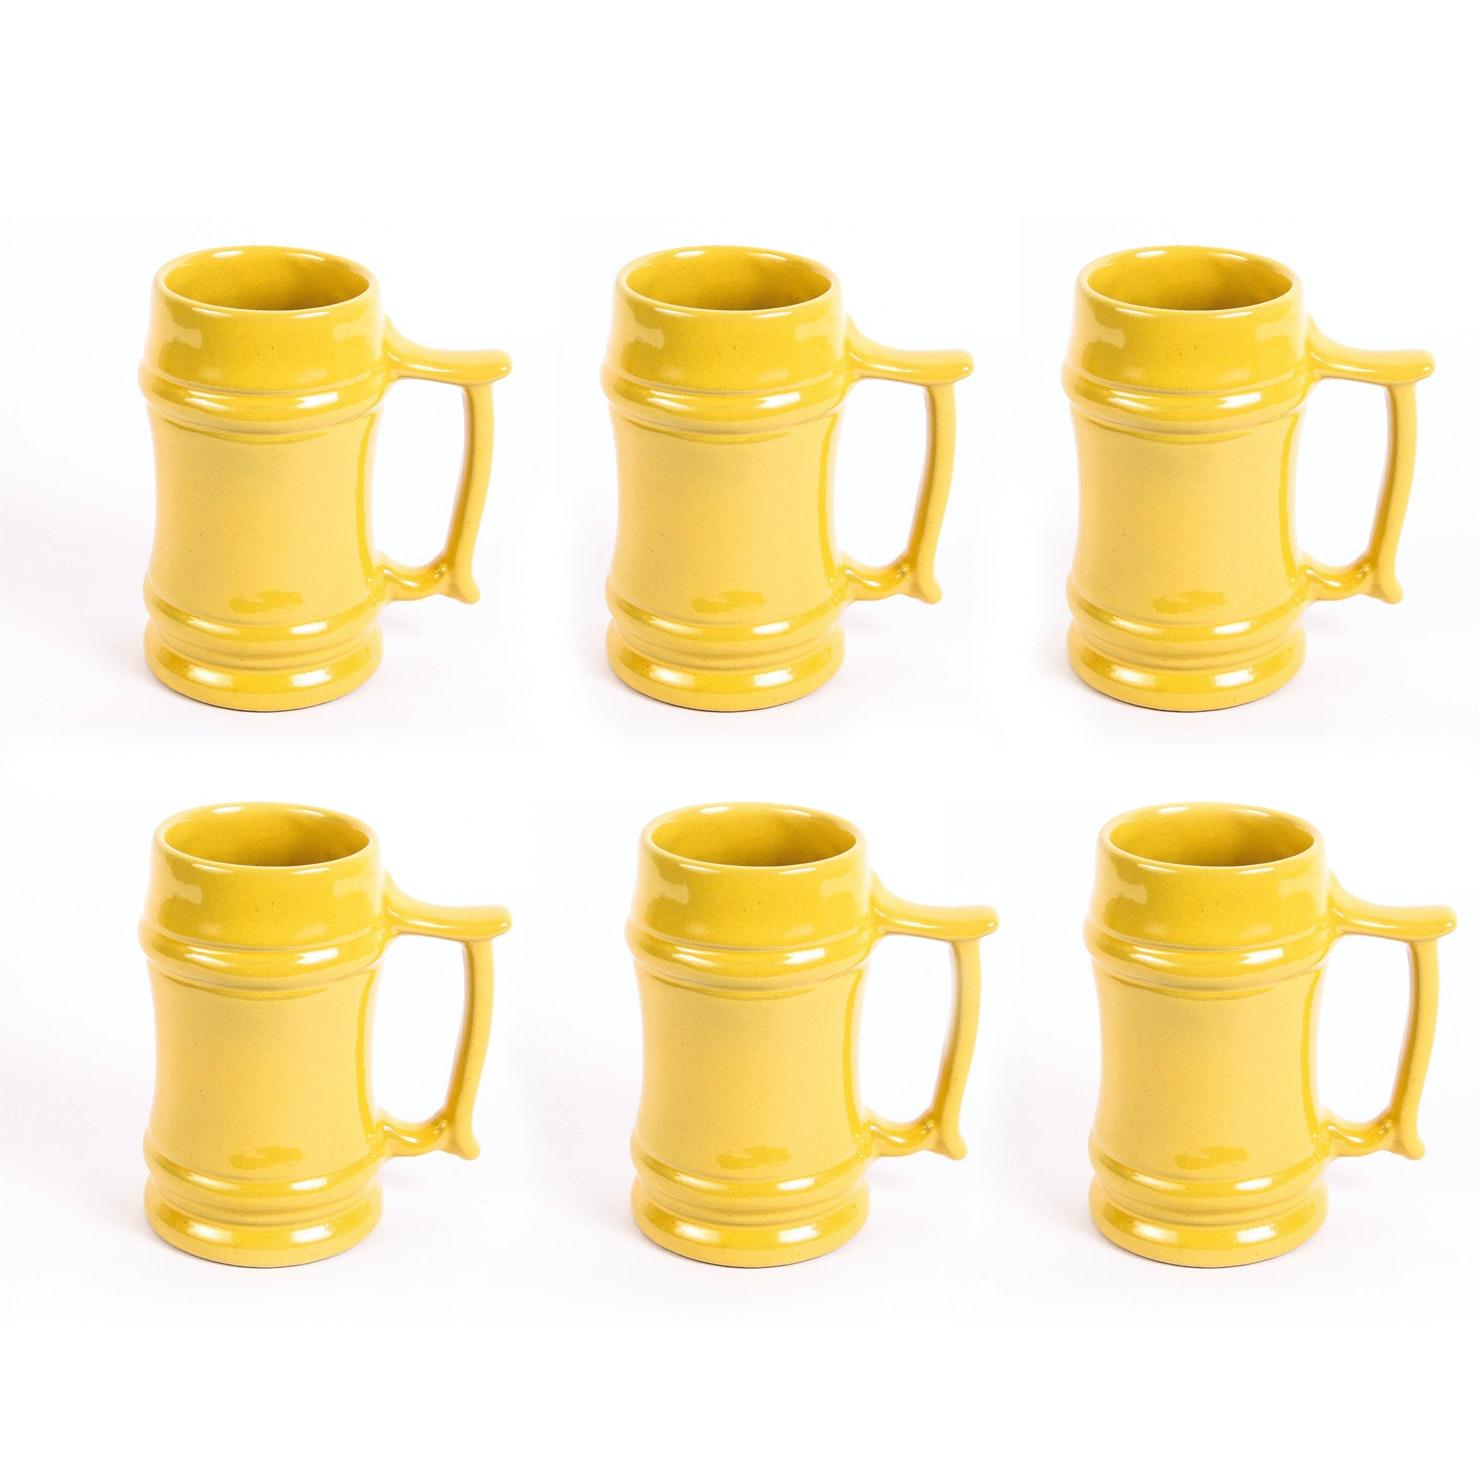 Set of Six Vintage Frankoma Pottery M2 Autumn Yellow Mugs ...  sc 1 st  EBTH.com & Set of Six Vintage Frankoma Pottery M2 Autumn Yellow Mugs : EBTH